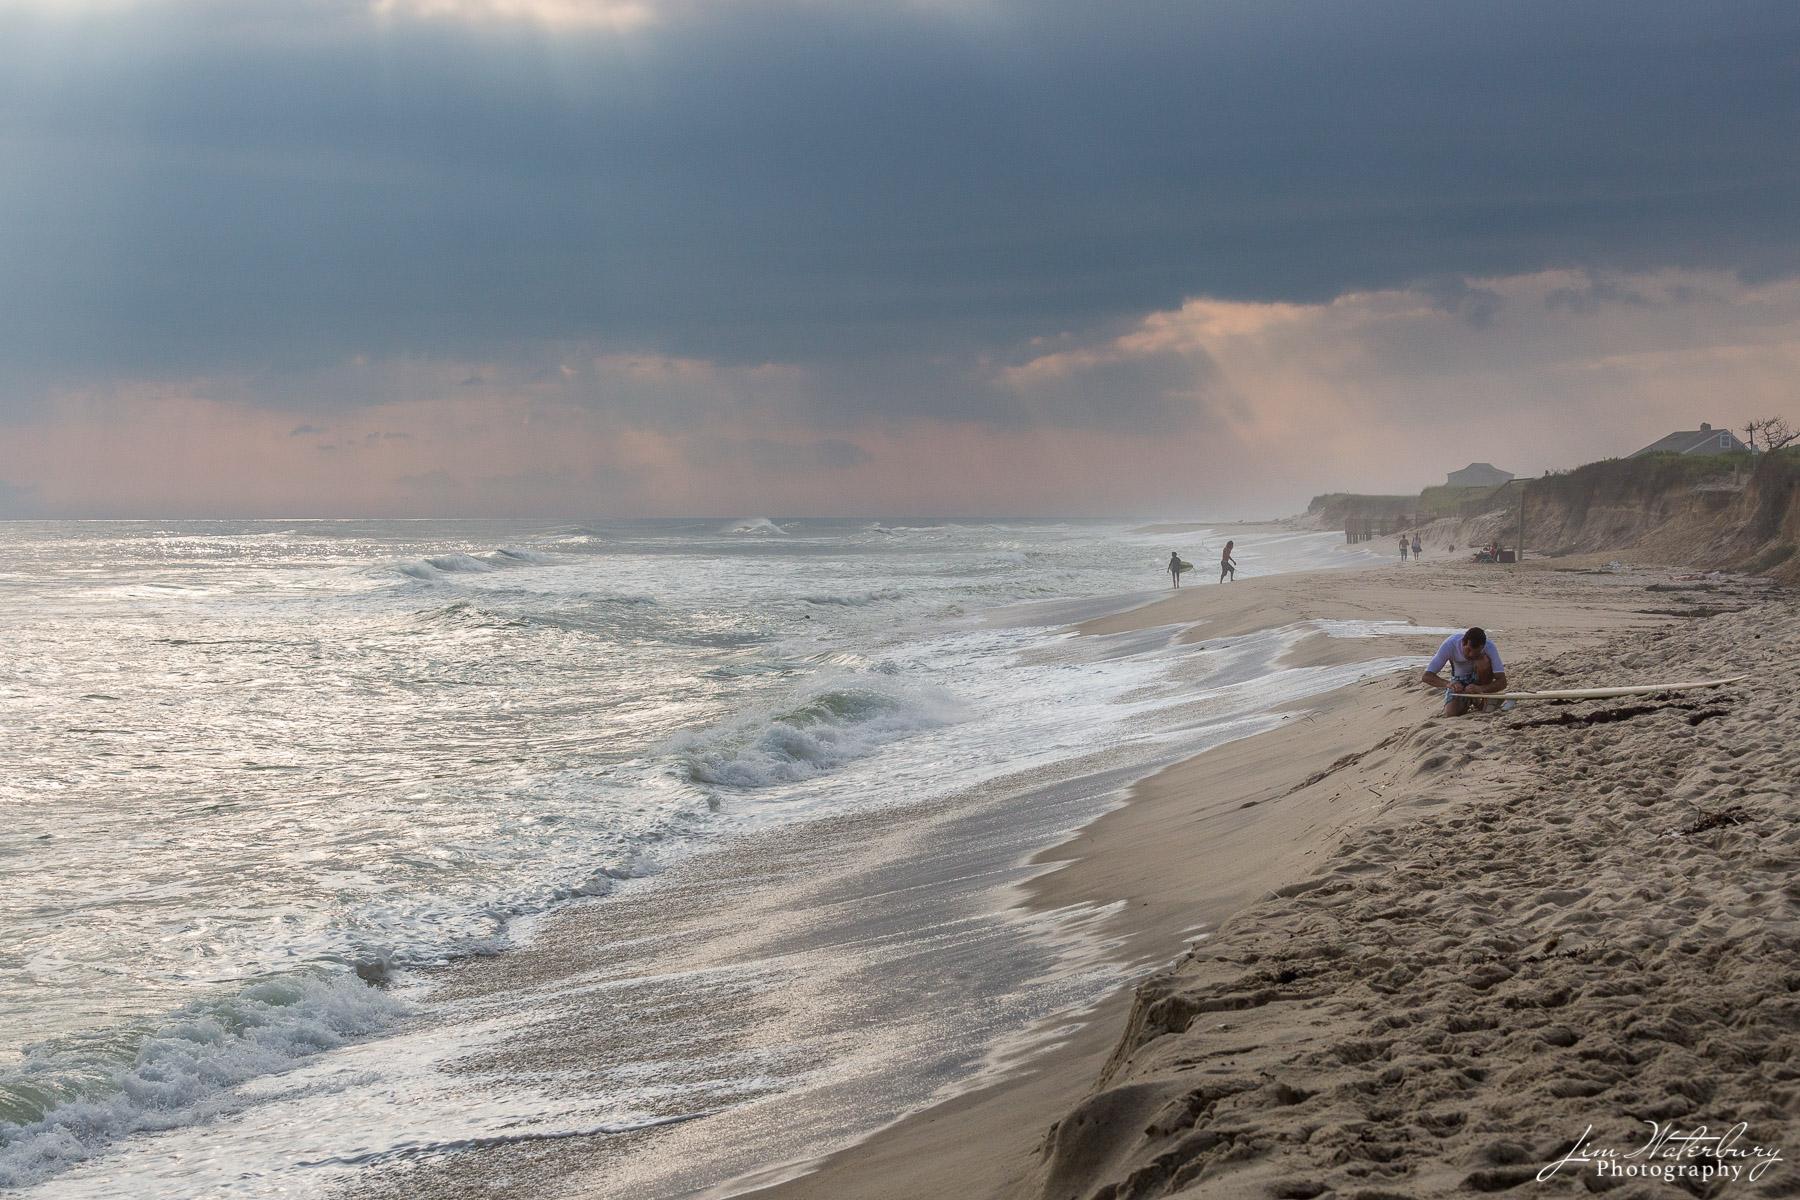 beach, waves, surfer, Cisco beach, Nantucket, photo